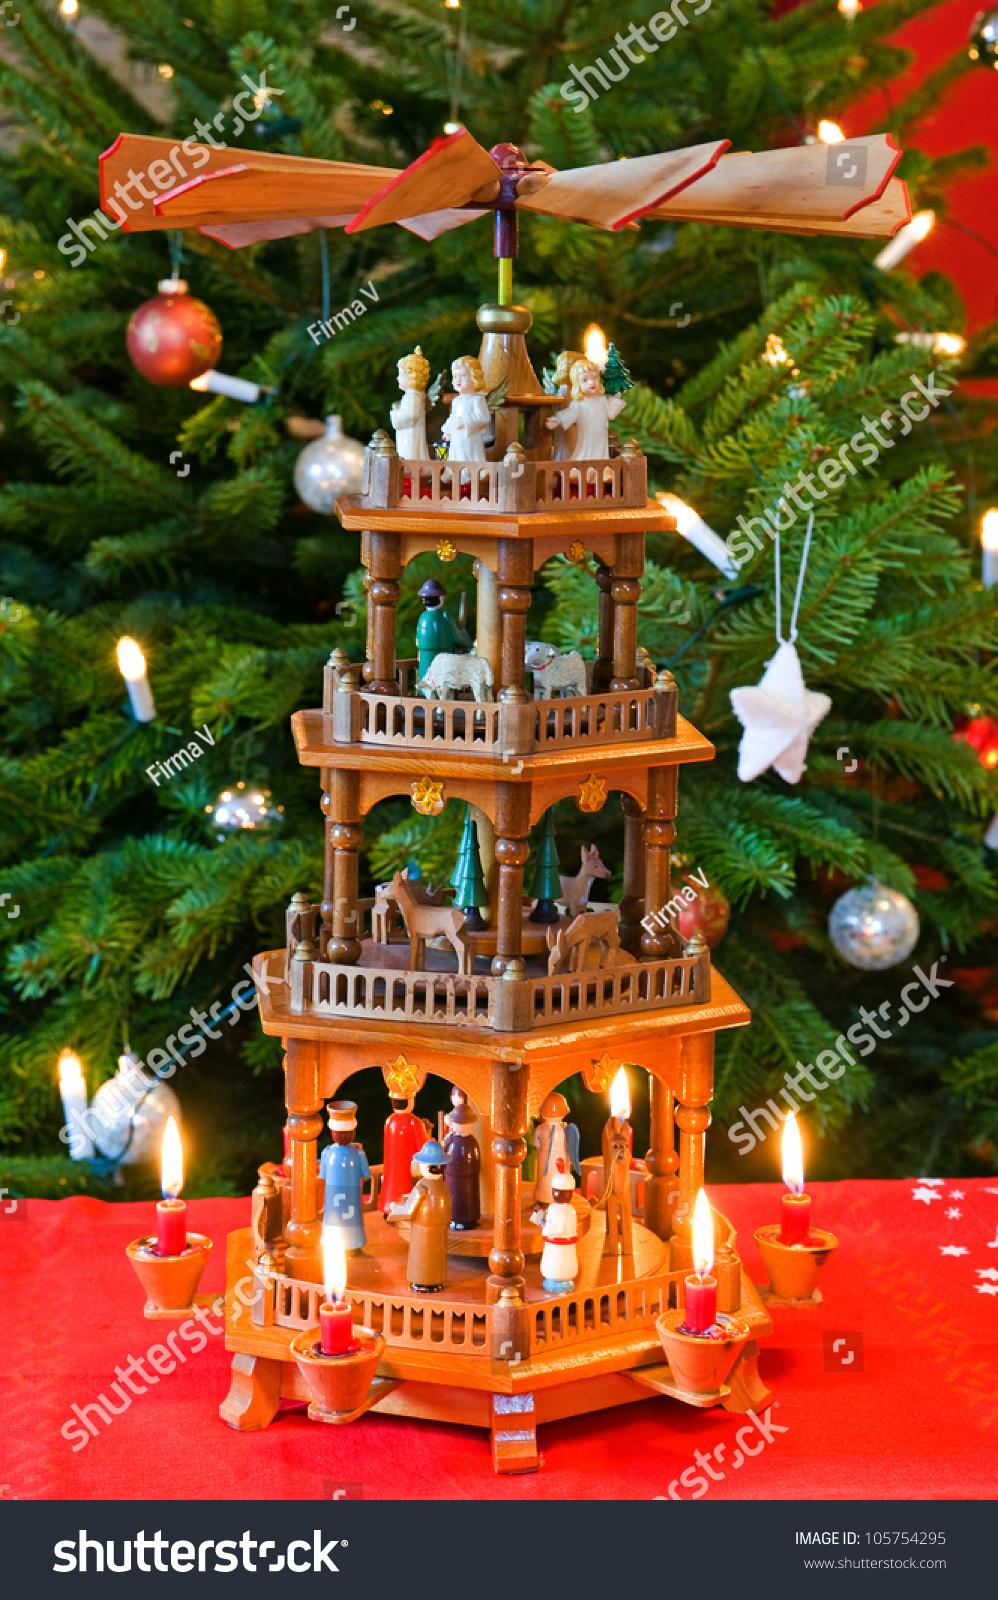 Pyramid christmas ornament - German Christmas Pyramid Preview Save To A Lightbox